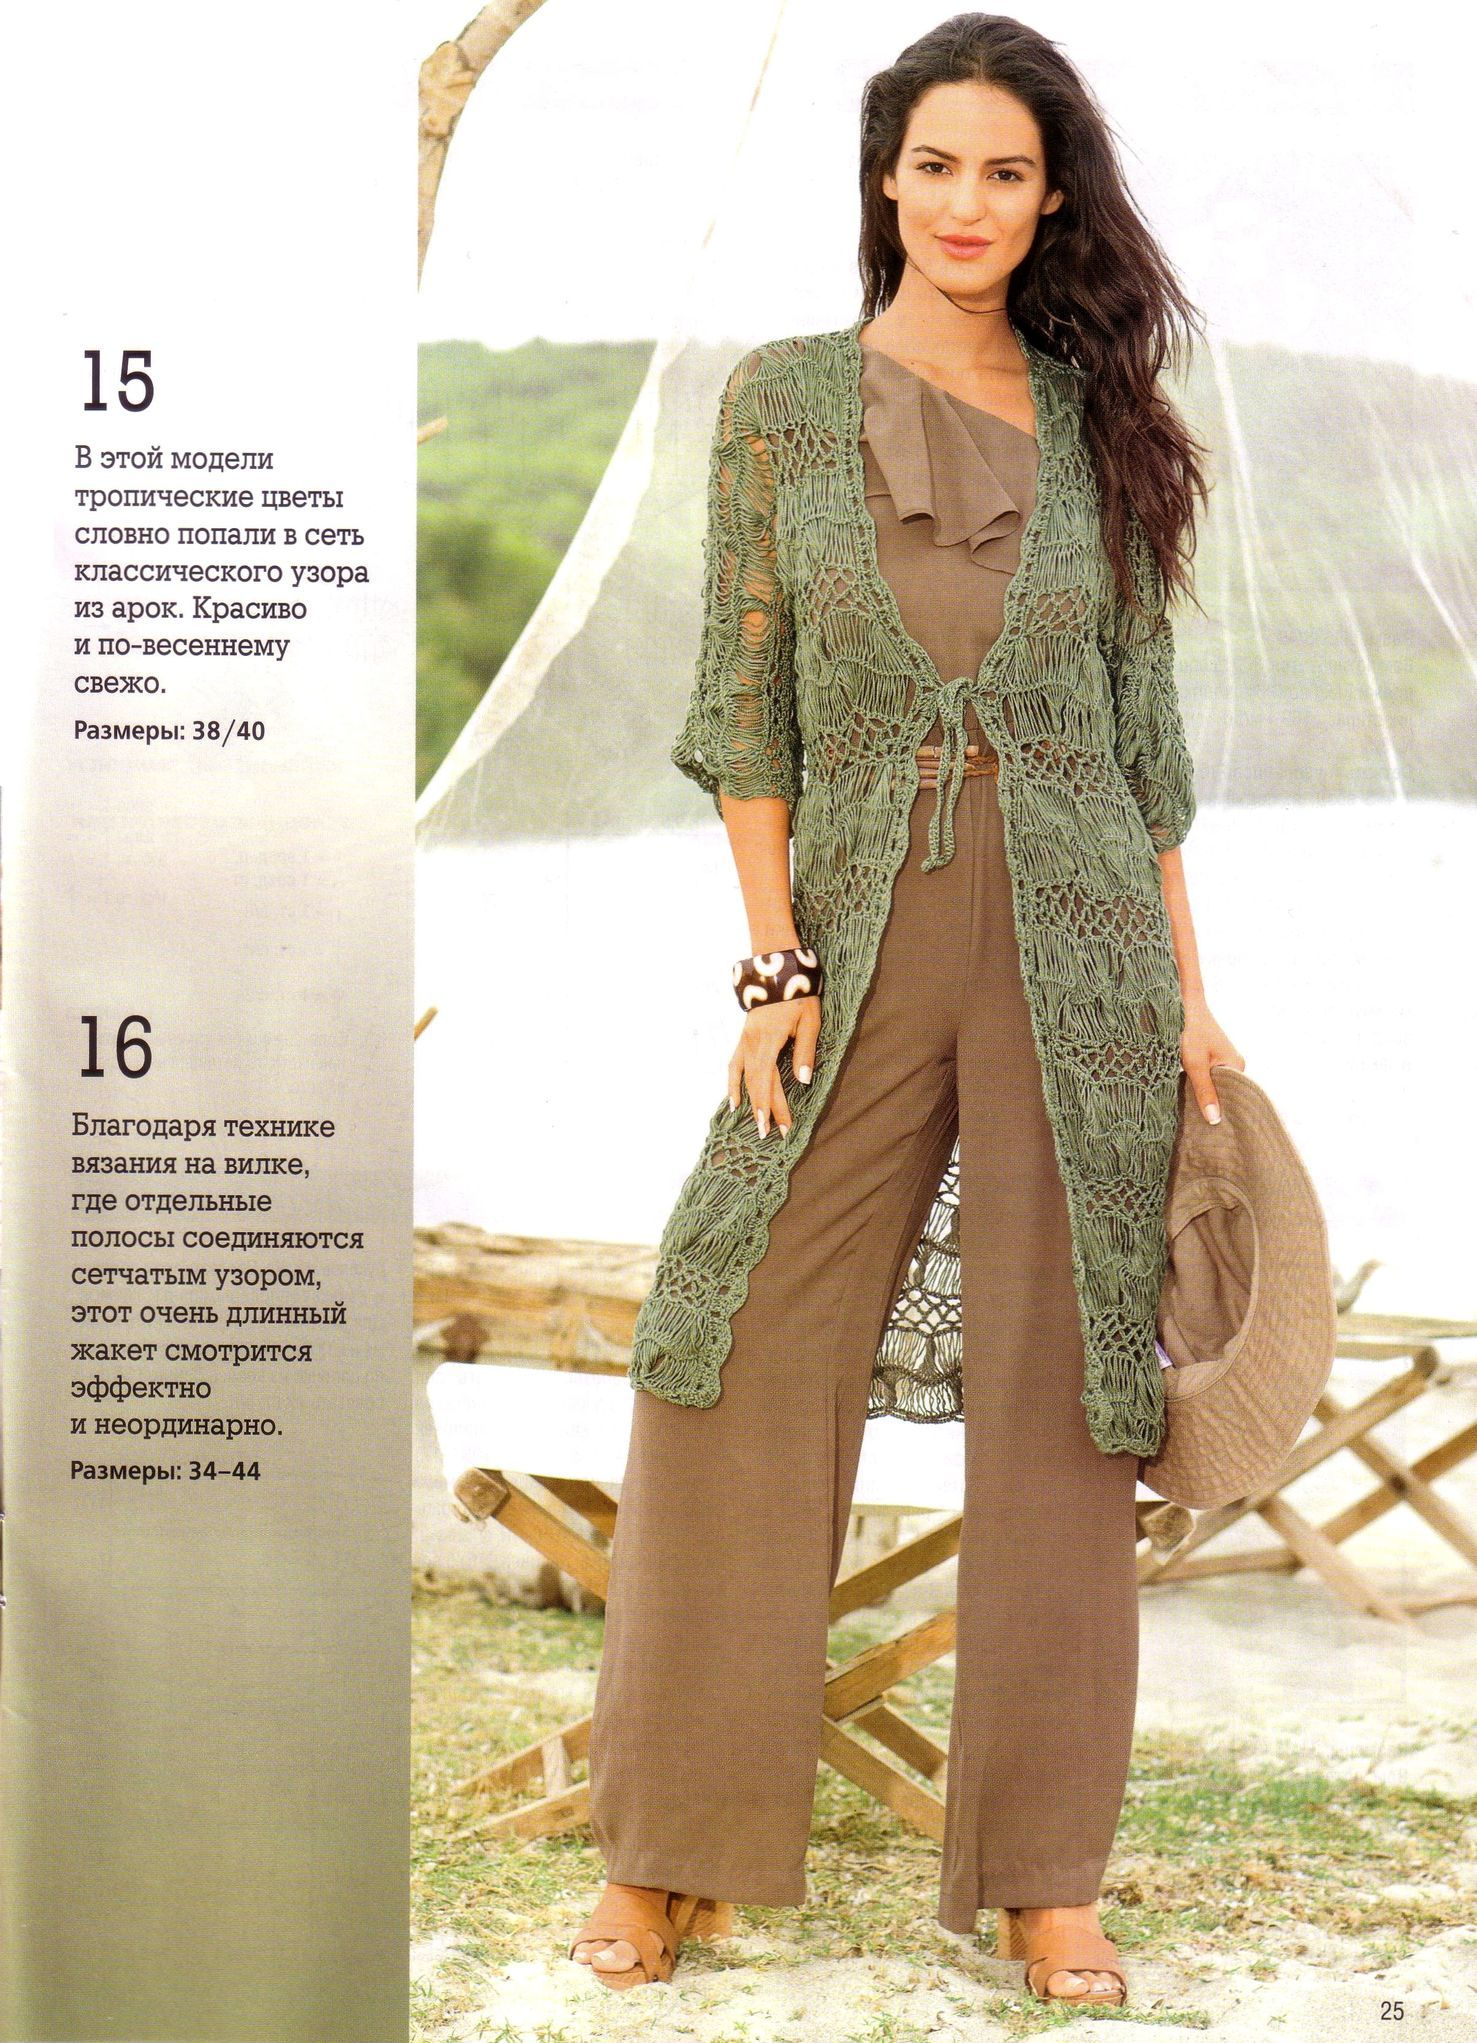 Pattern: Hairpin Crochet Long Cardigan http://media-cache-ec0.pinimg ...